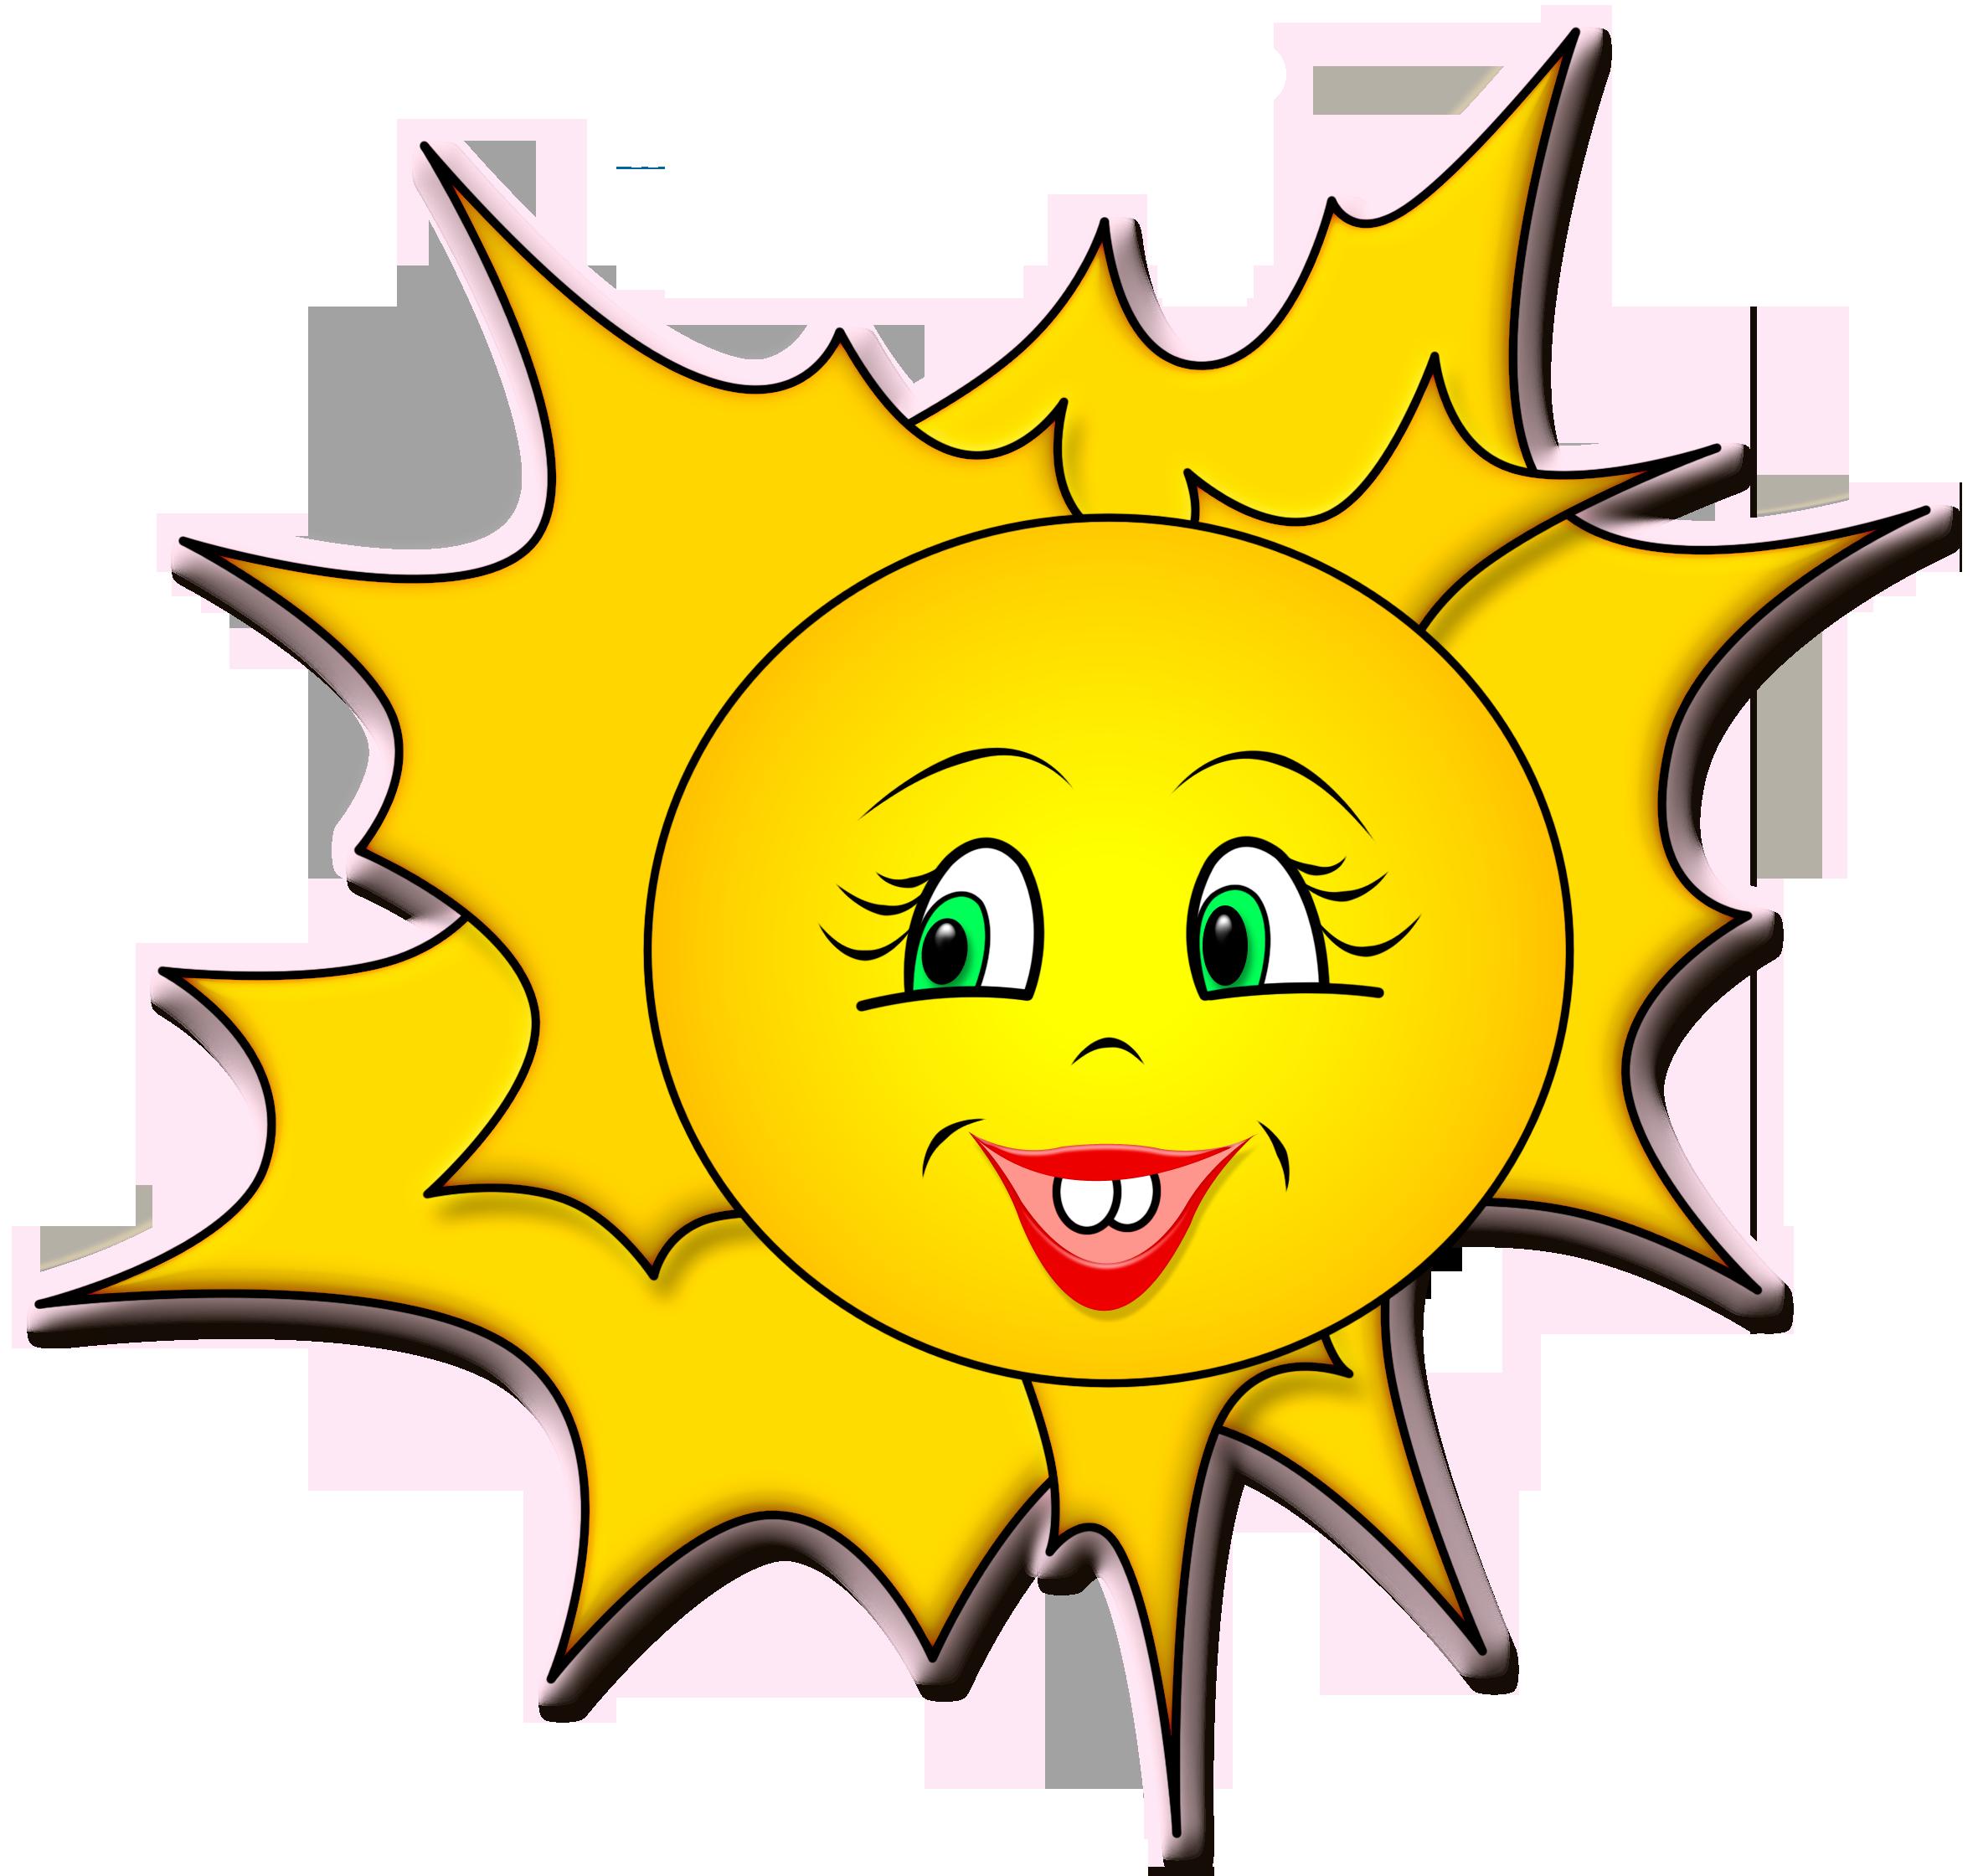 картинка солнышко без улыбки для рефлексии обрабатывают